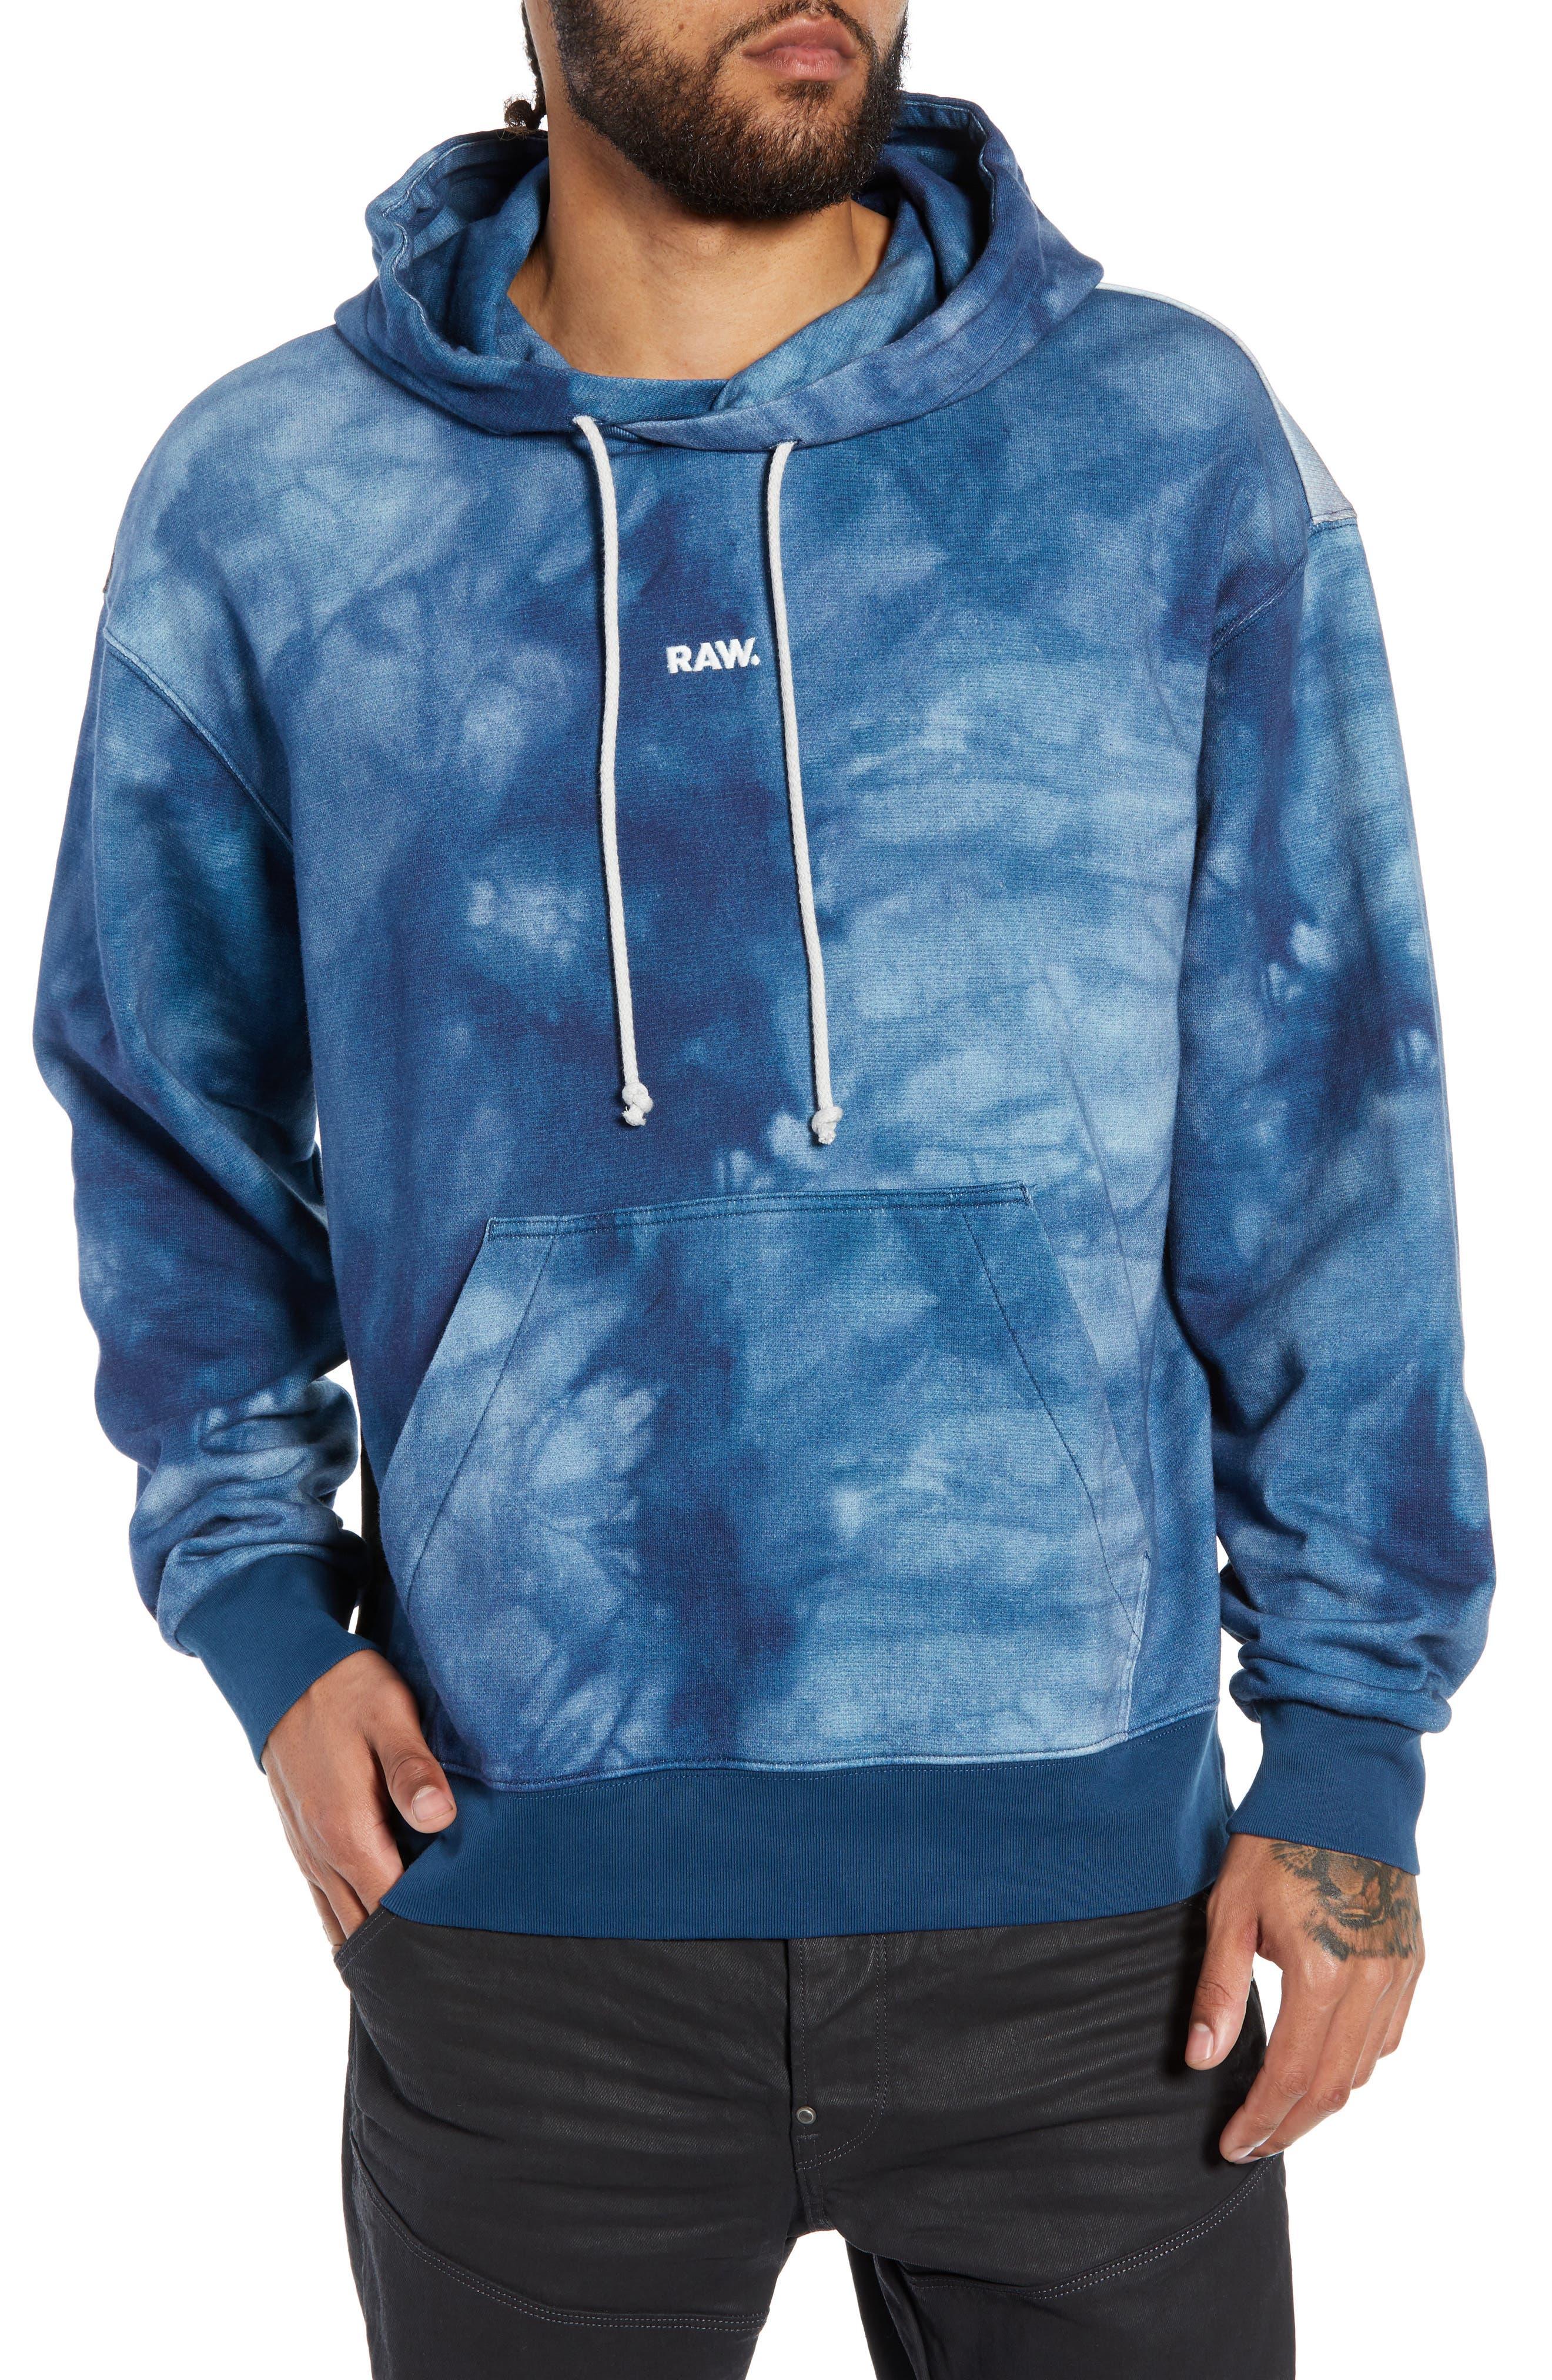 Cryrer Waterfall Hooded Sweatshirt,                         Main,                         color, TEAL BLUE